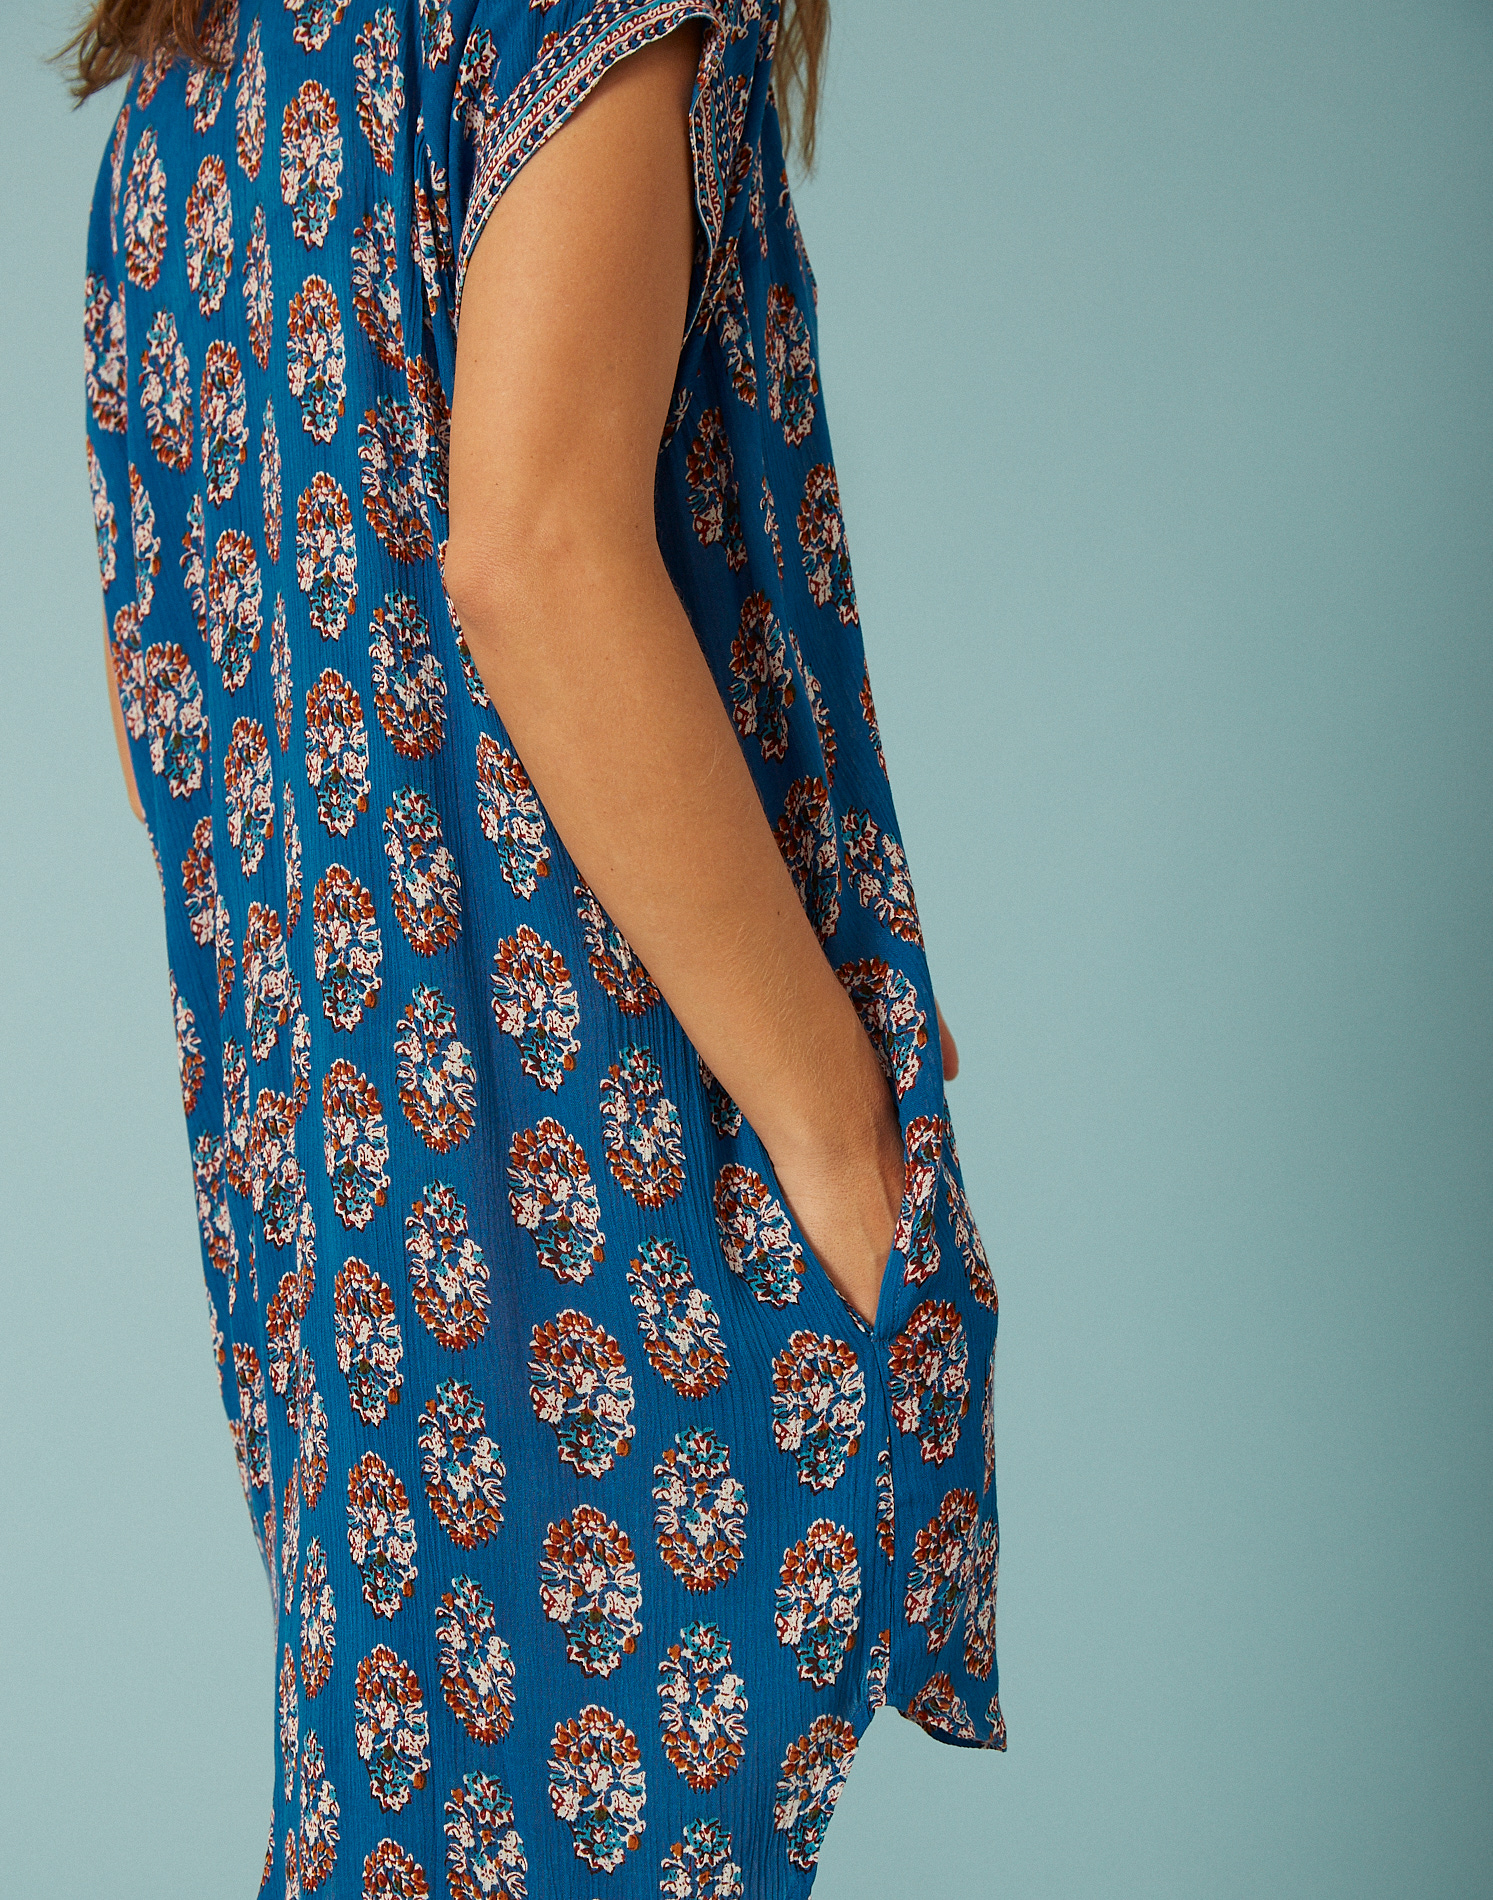 Indi short sleeve dress